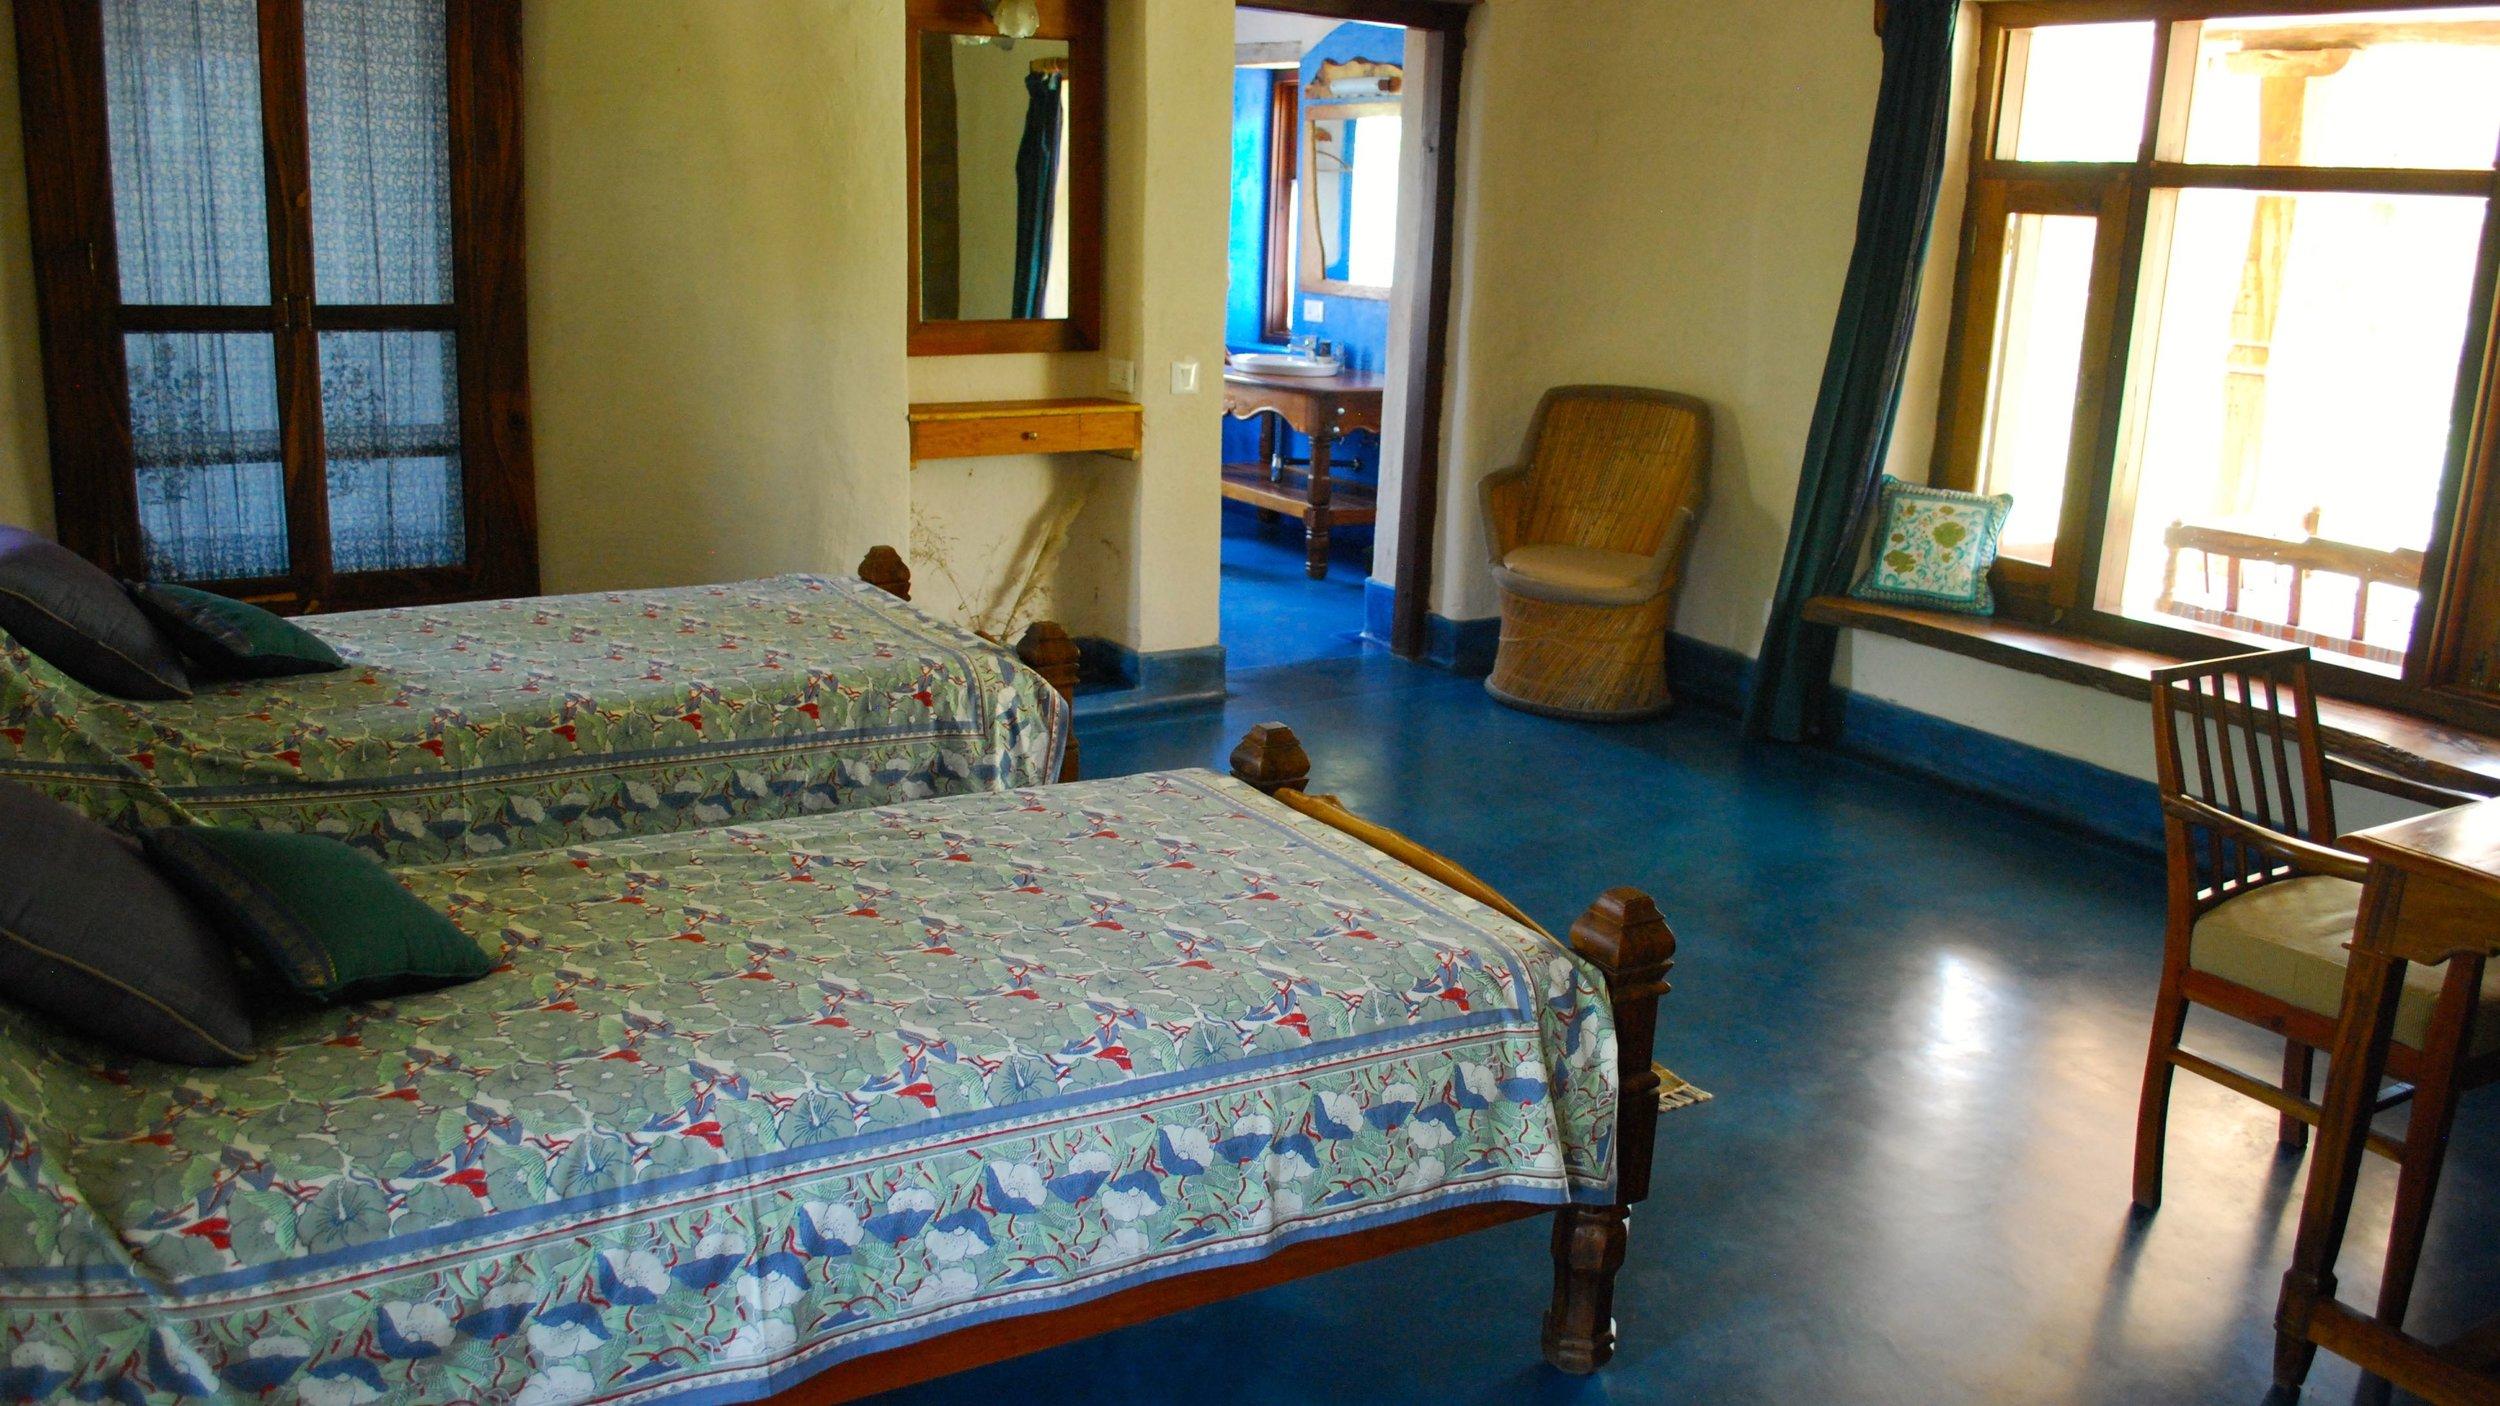 India-Madhya-Pradesh-Sara-at-Toria-room.jpg